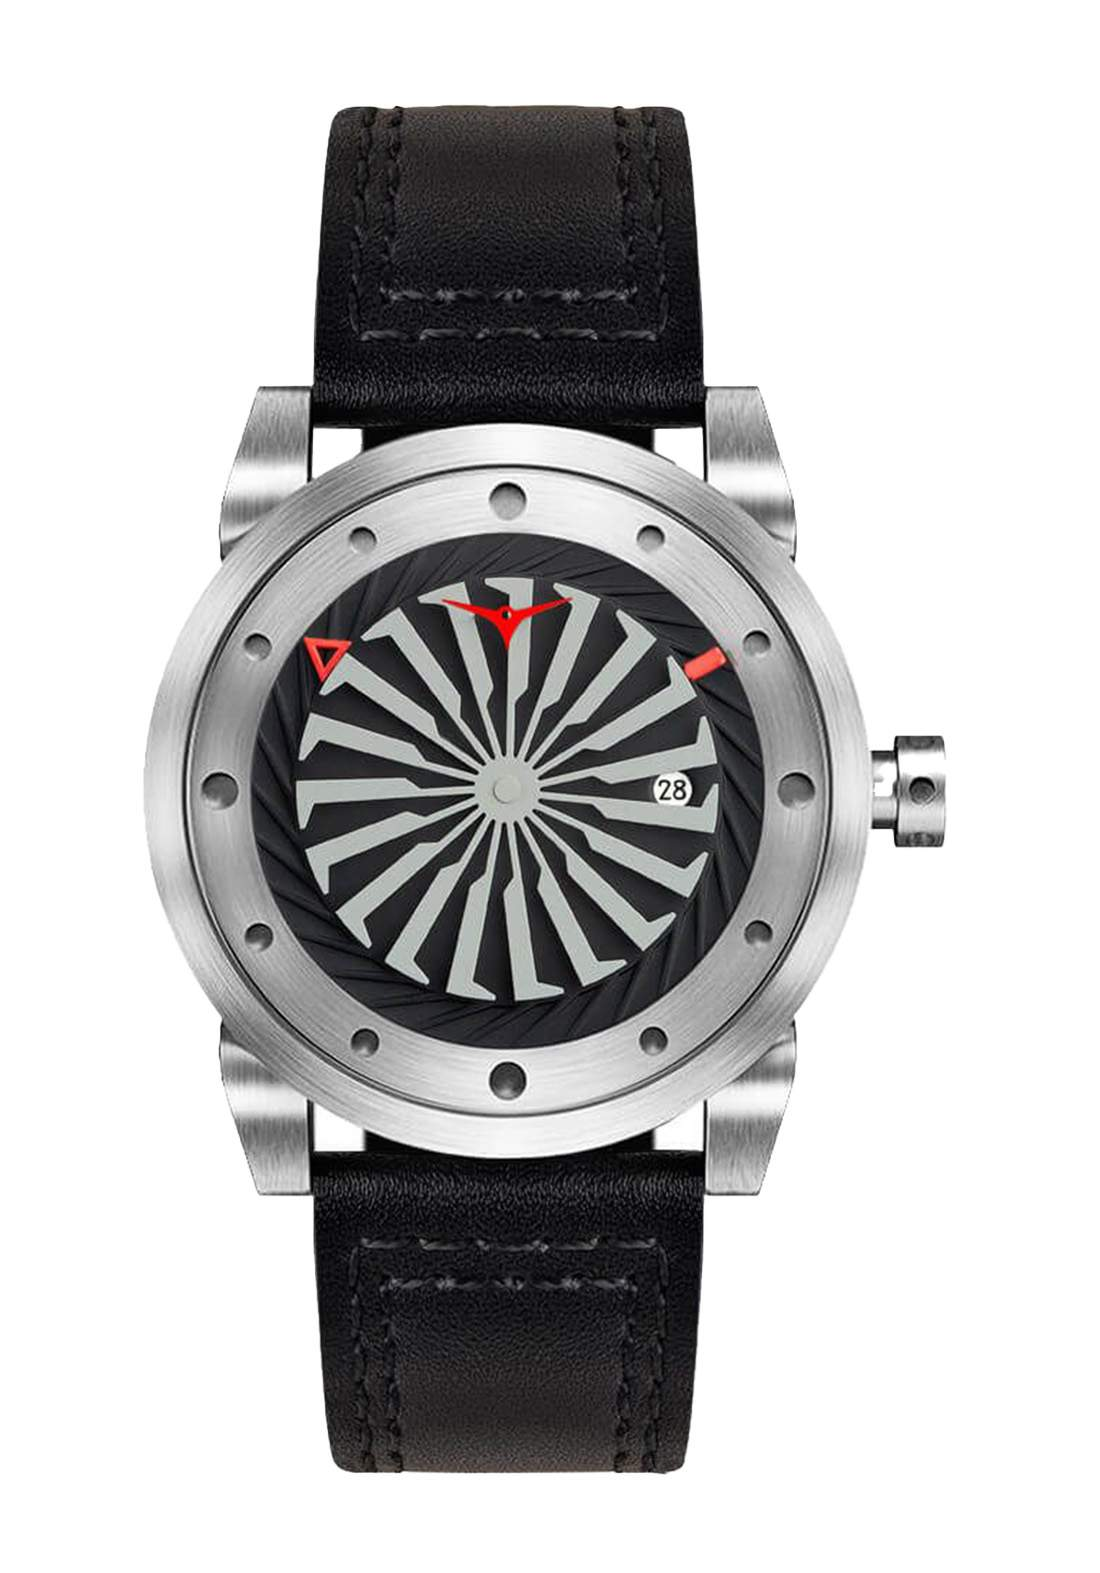 Zinvo Rival Watch For Men - Silver  ساعة رجالي